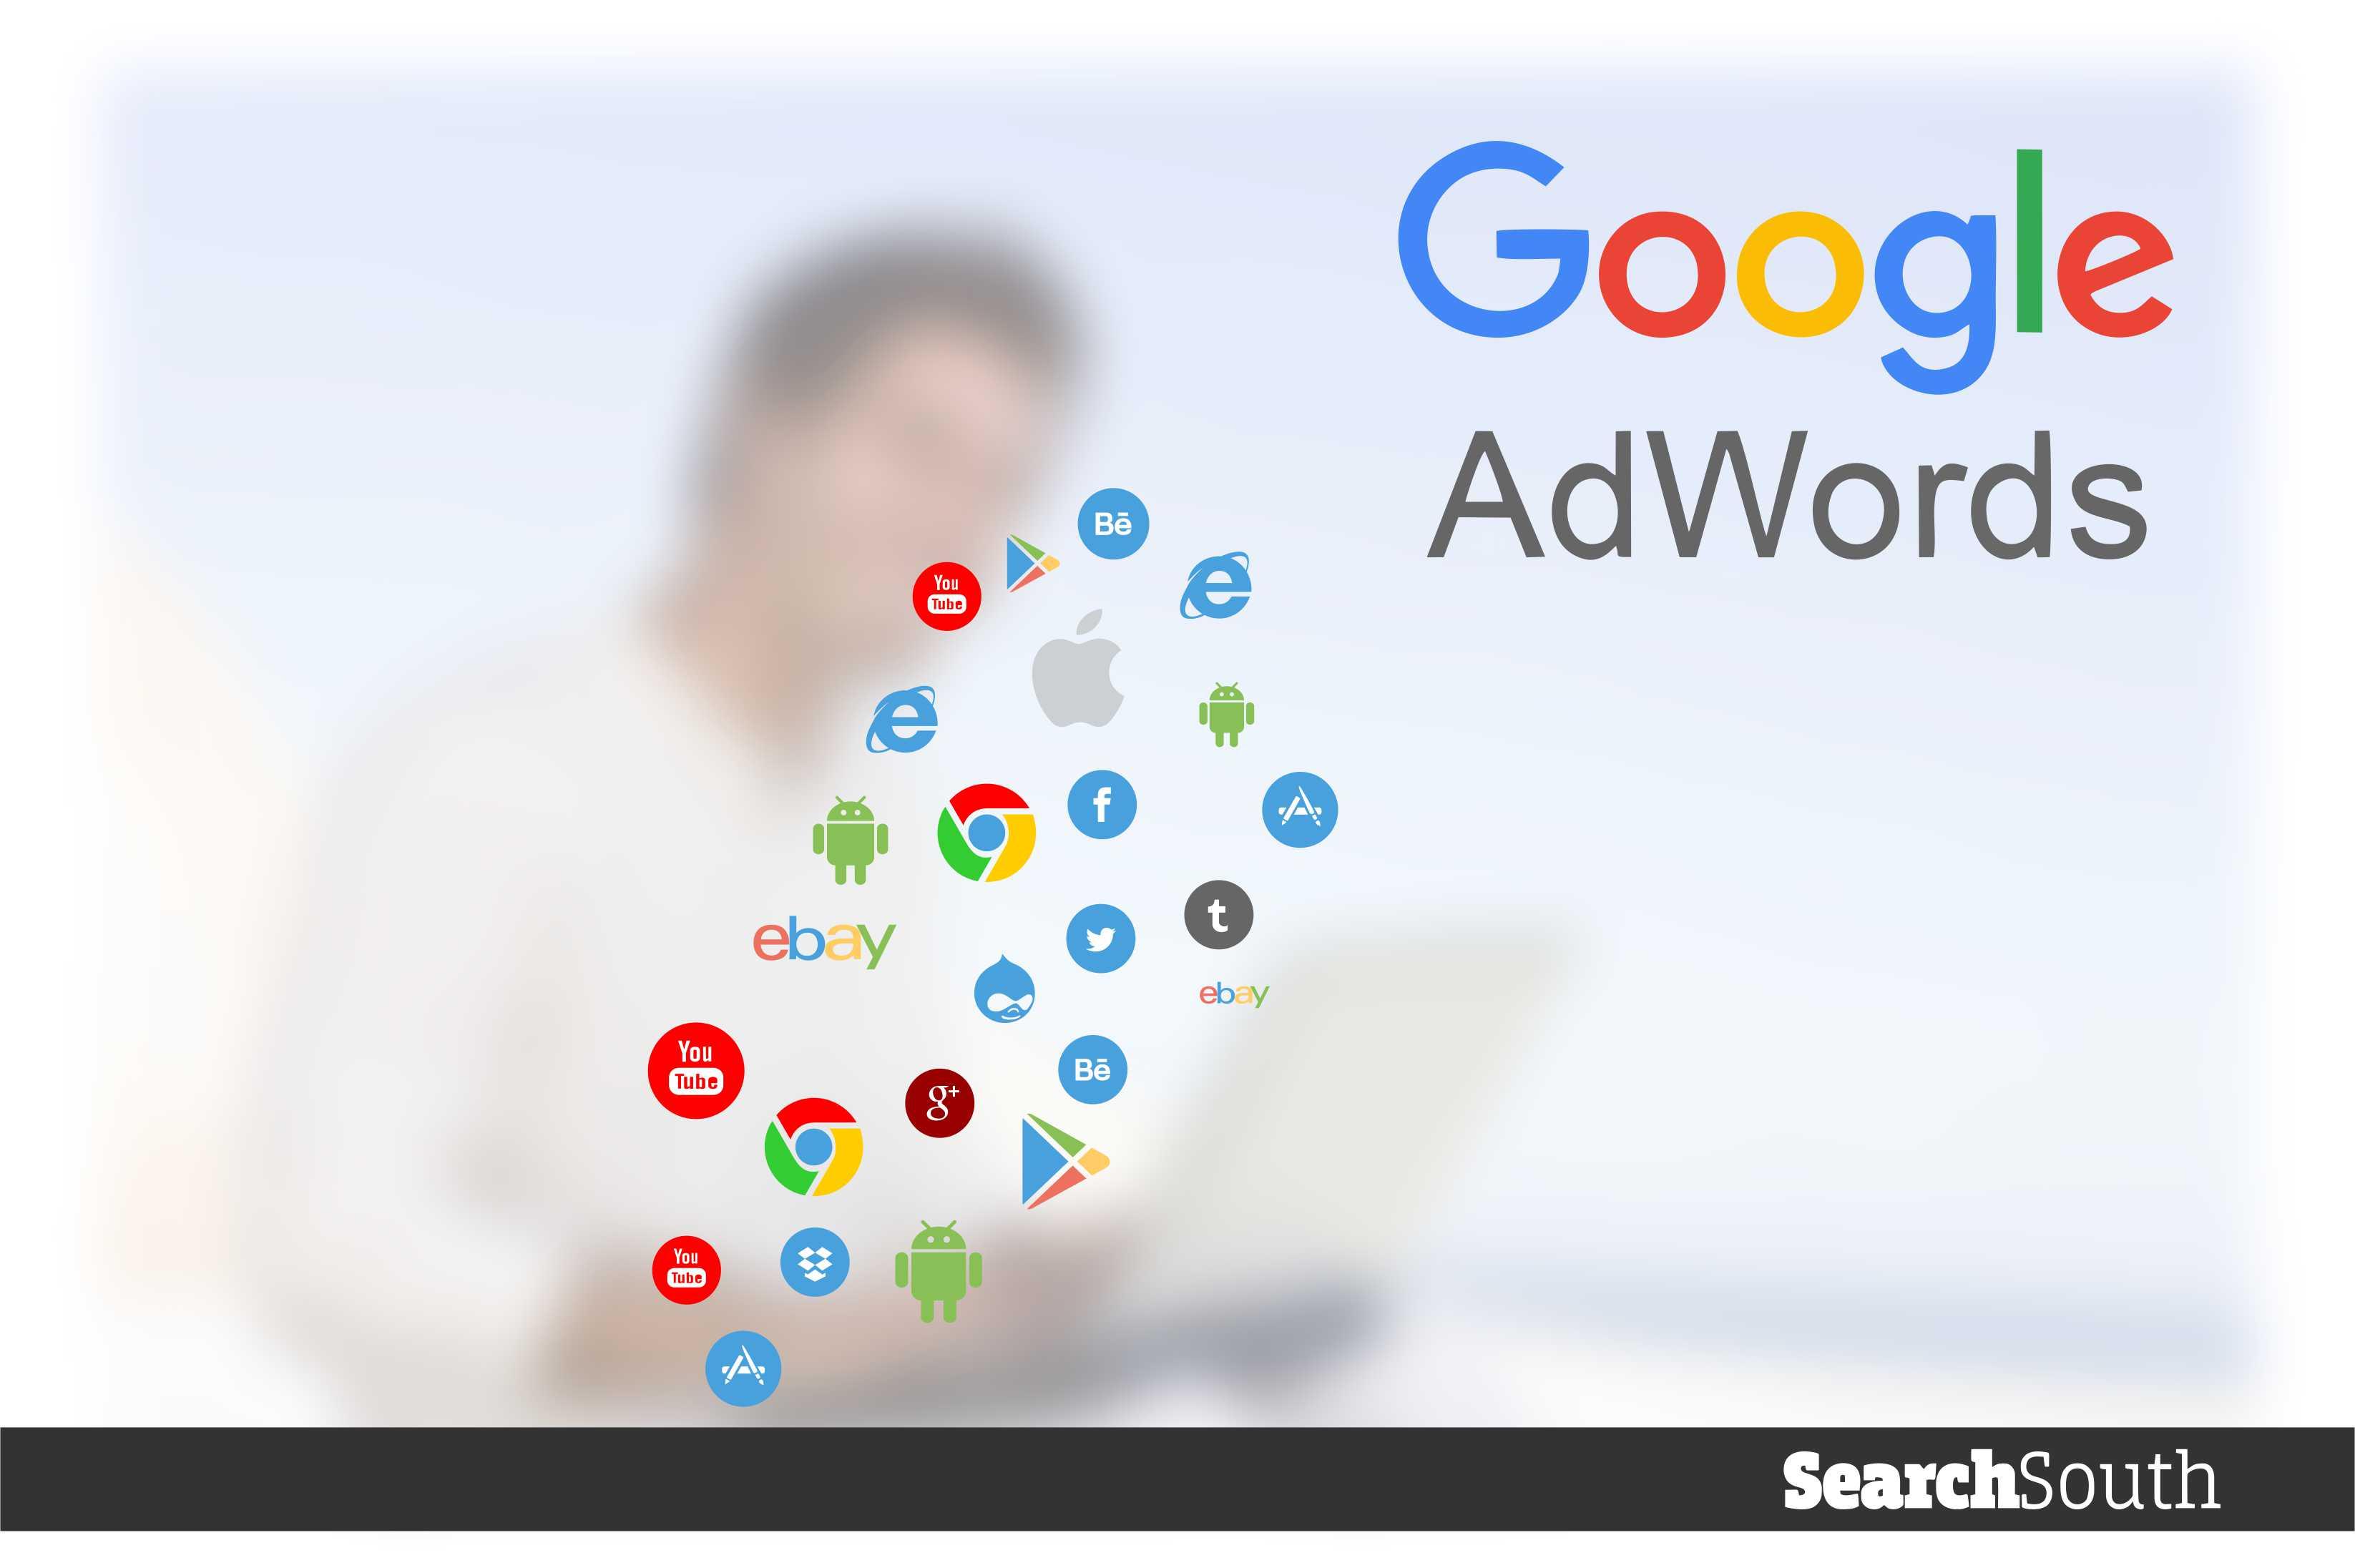 Google's market share